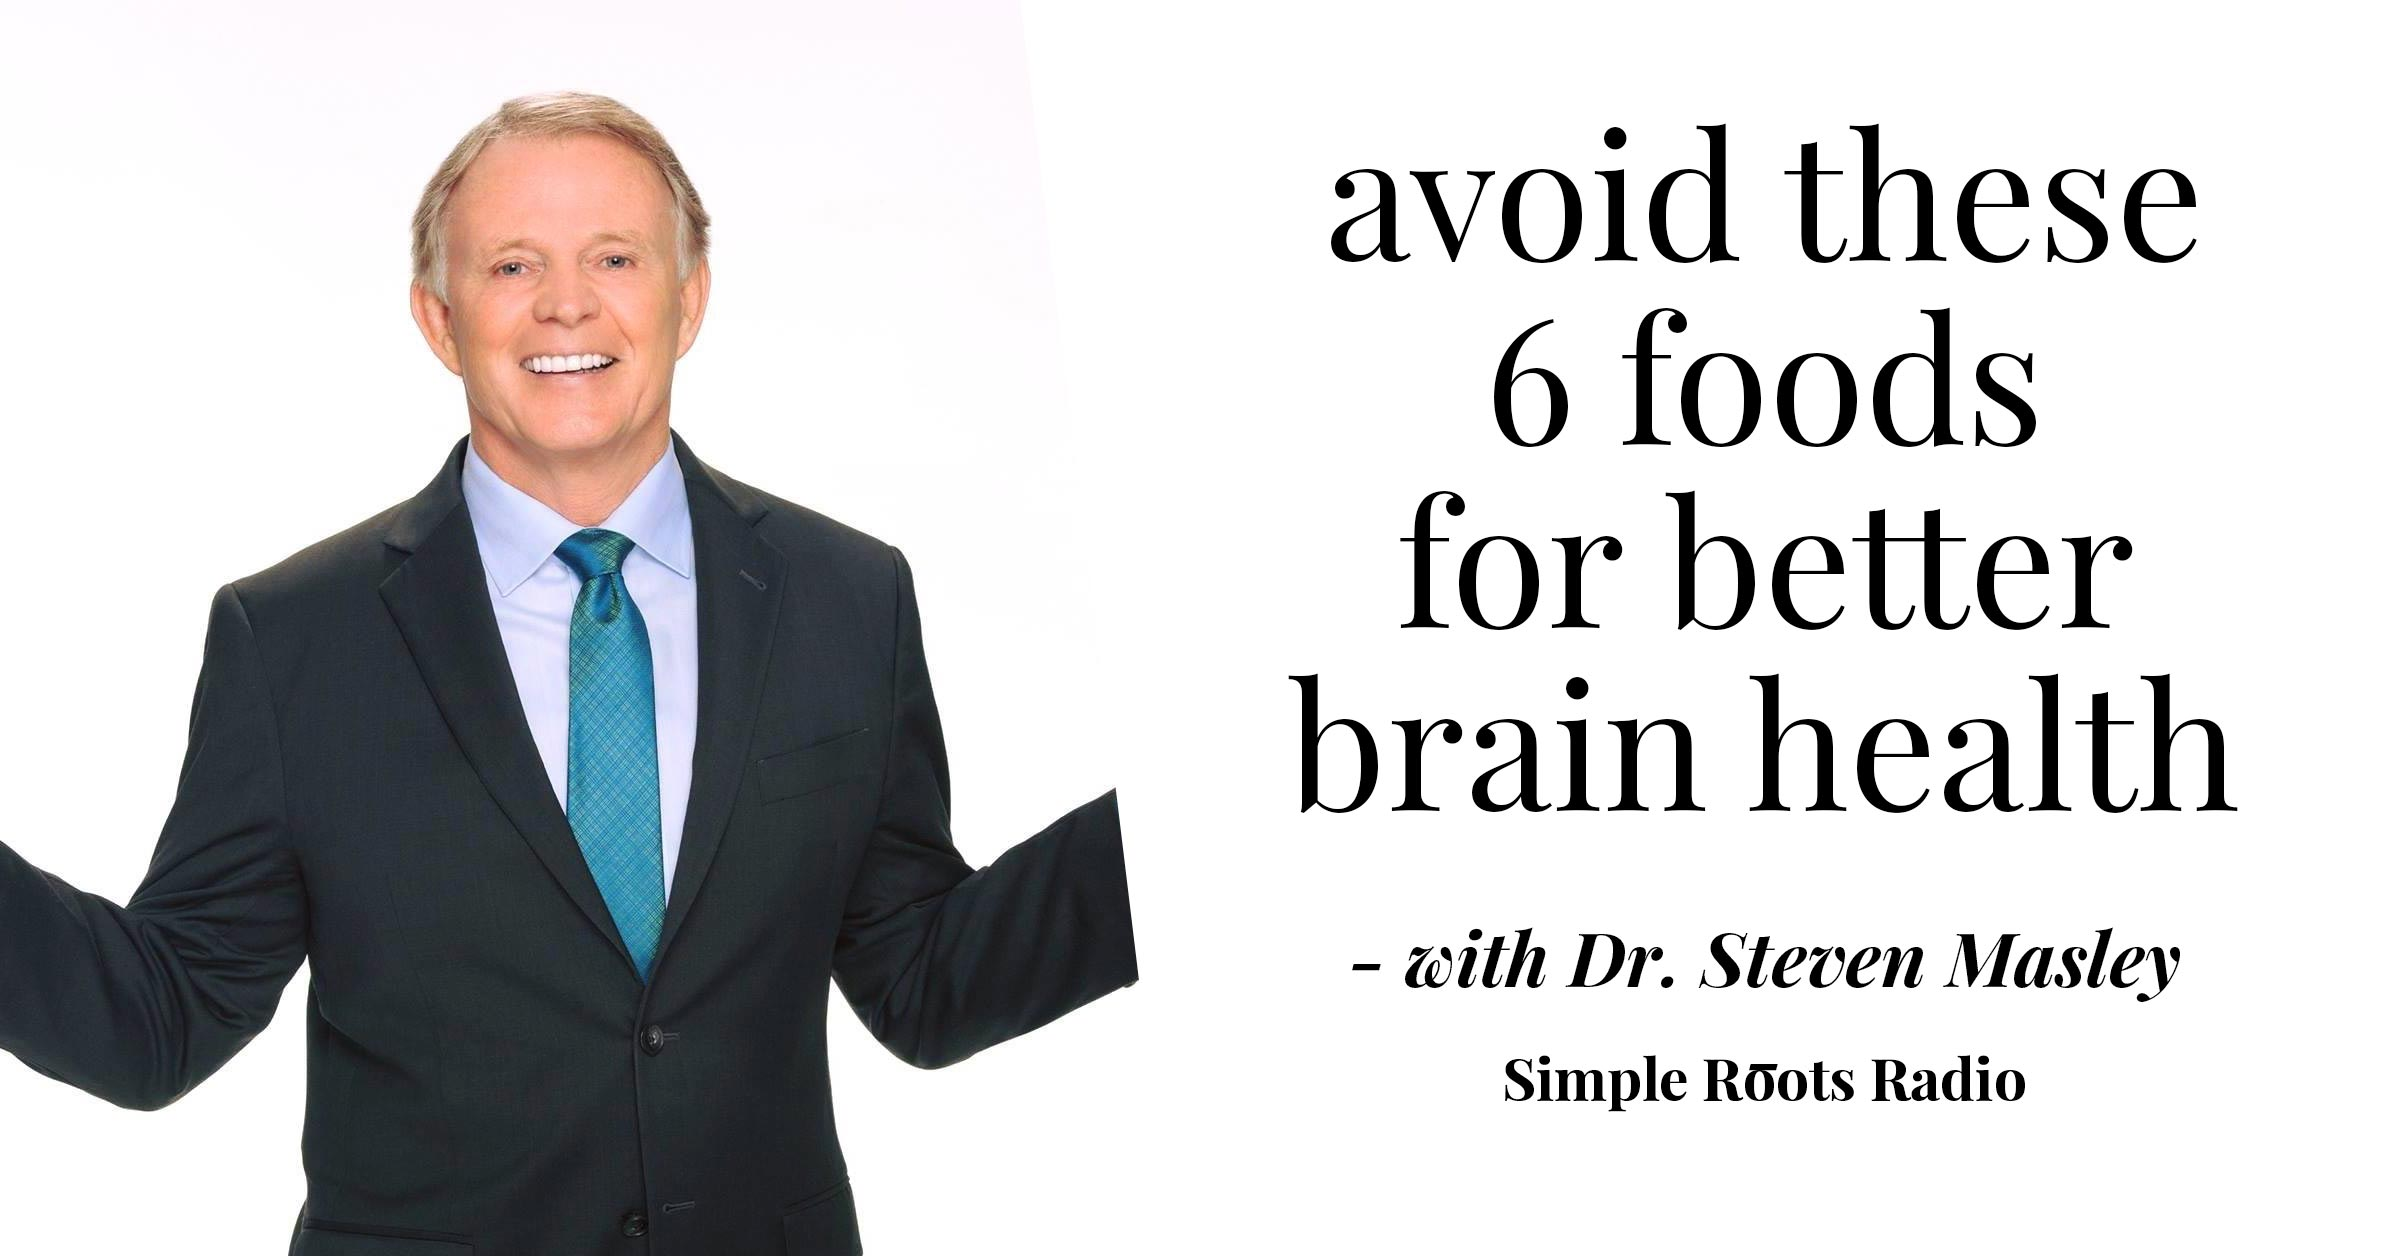 Stop Eating These Six Foods For Better Brain Health | Dr. Steven Masley #brainhealth #health #resolutions #eatthisnotthat